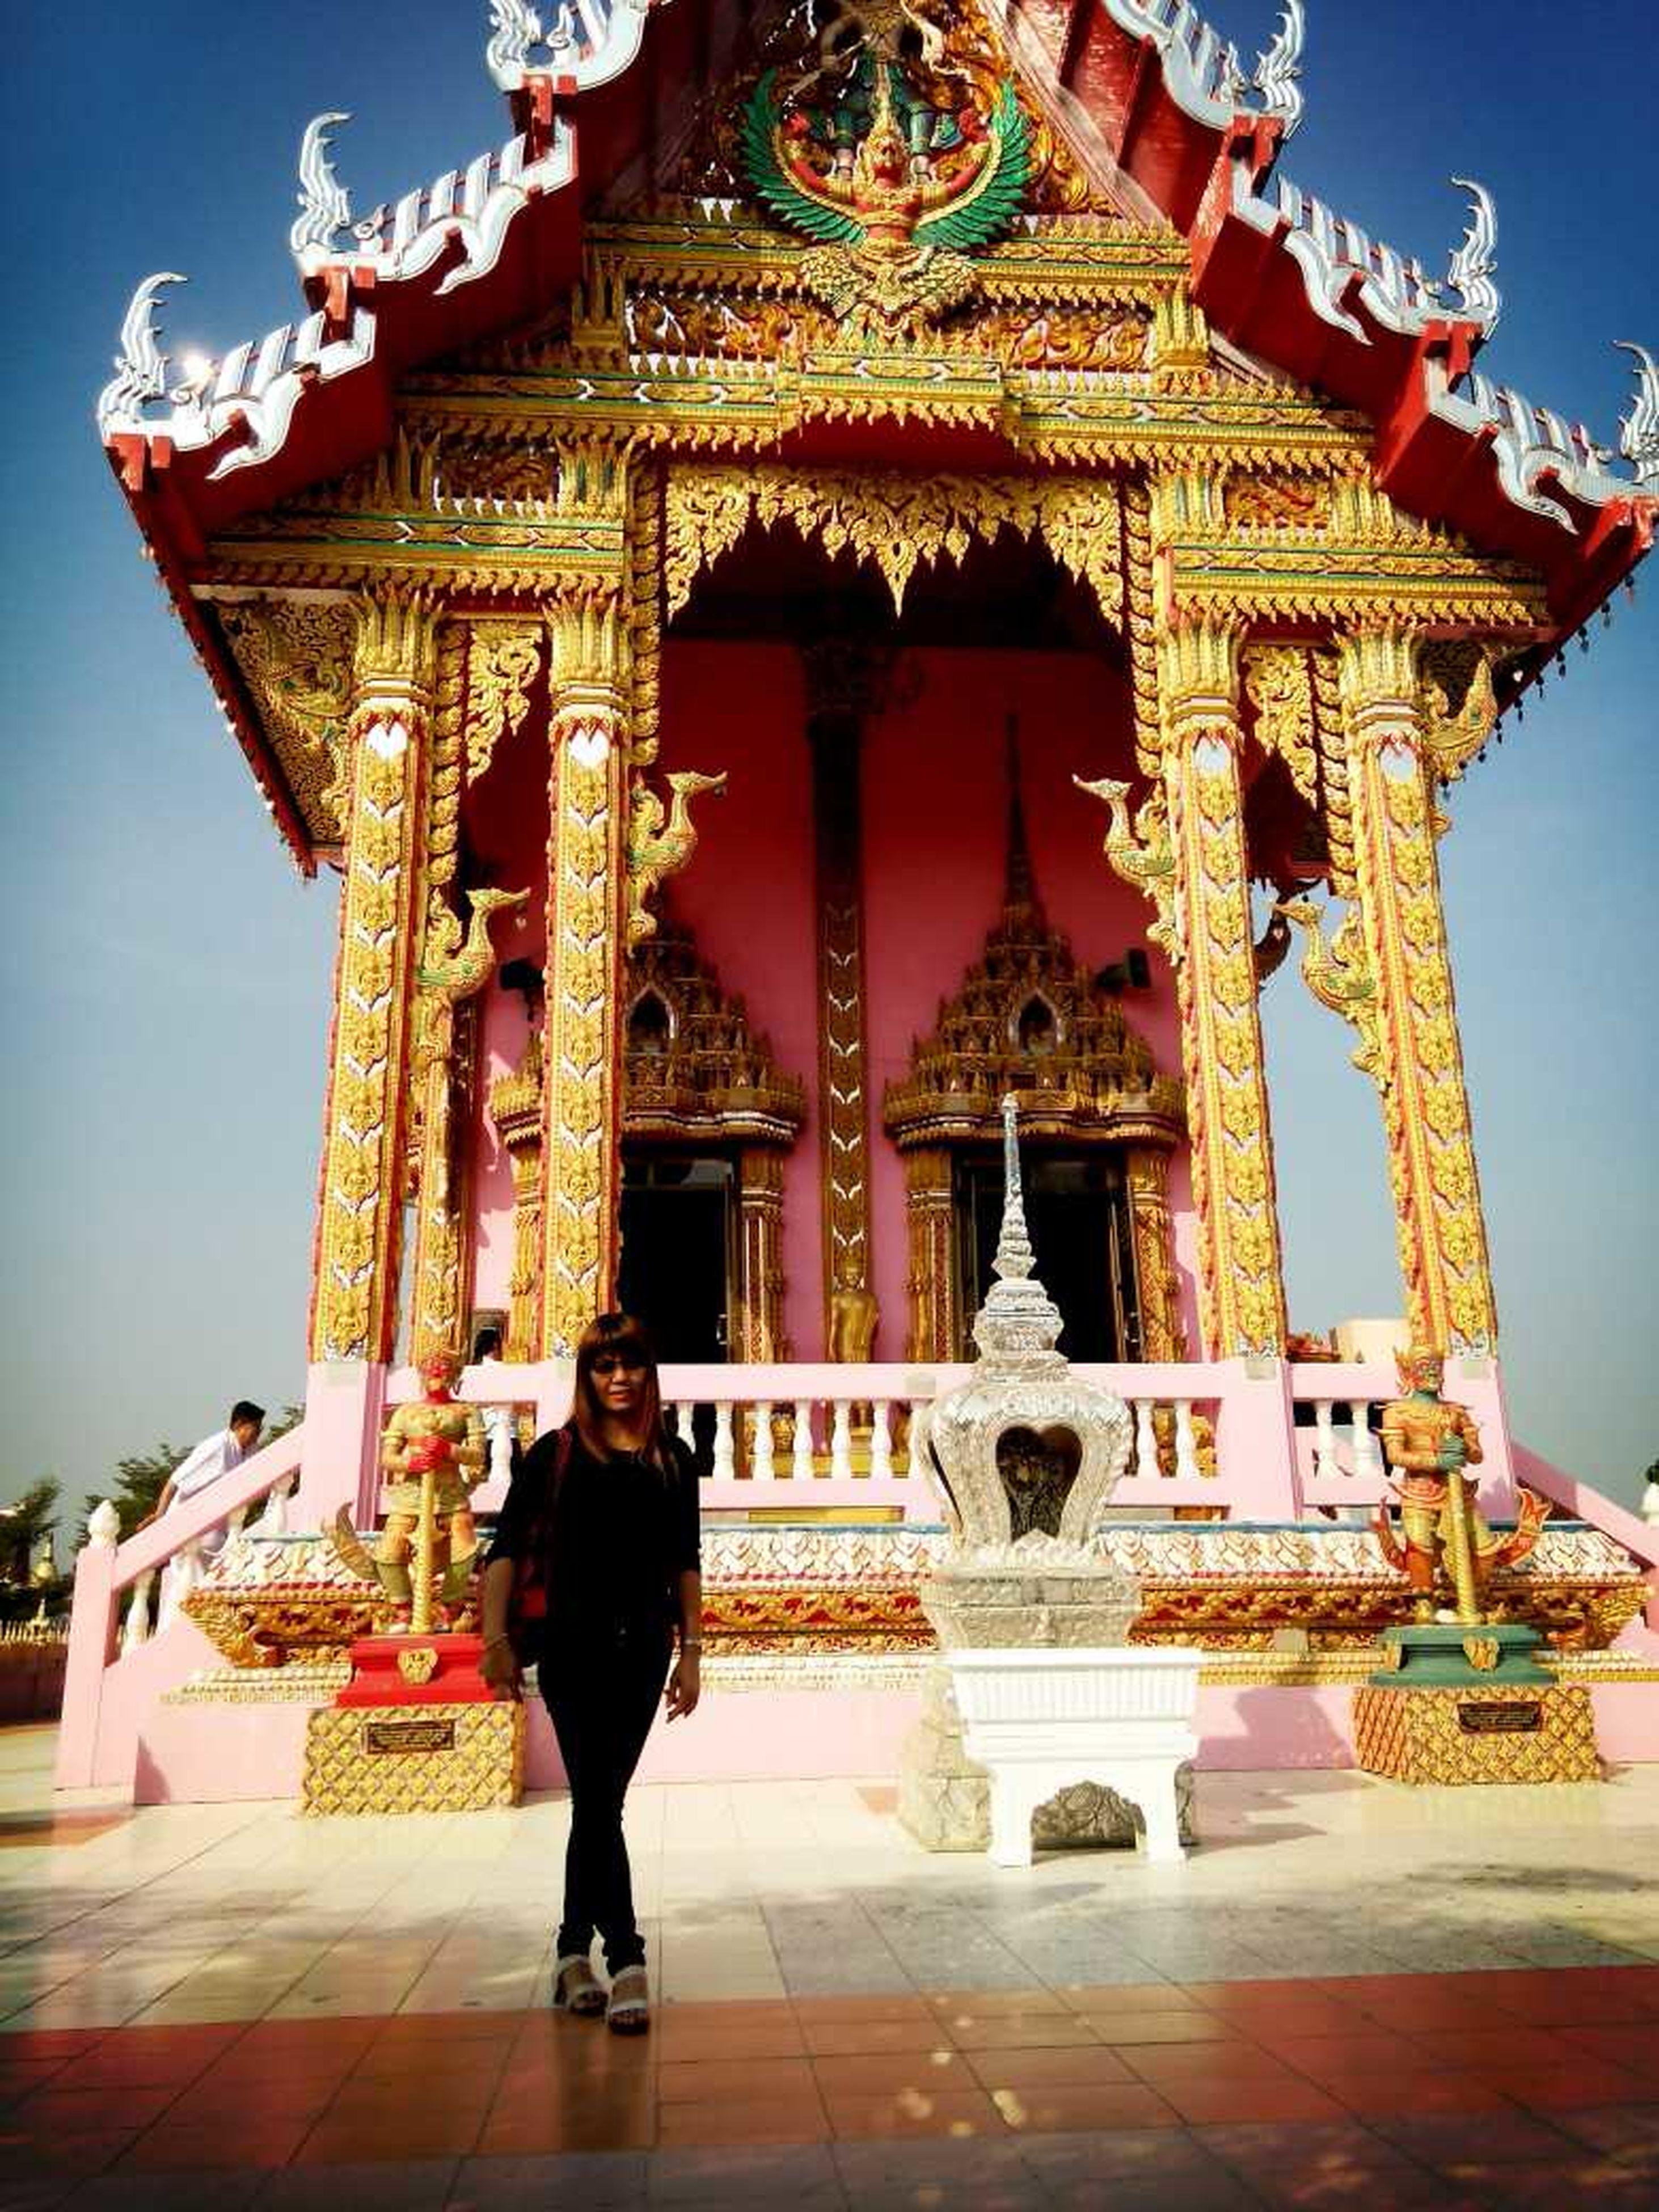 place of worship, architecture, built structure, religion, spirituality, person, building exterior, lifestyles, famous place, temple - building, leisure activity, travel destinations, tourism, men, travel, tourist, tradition, full length, cultures